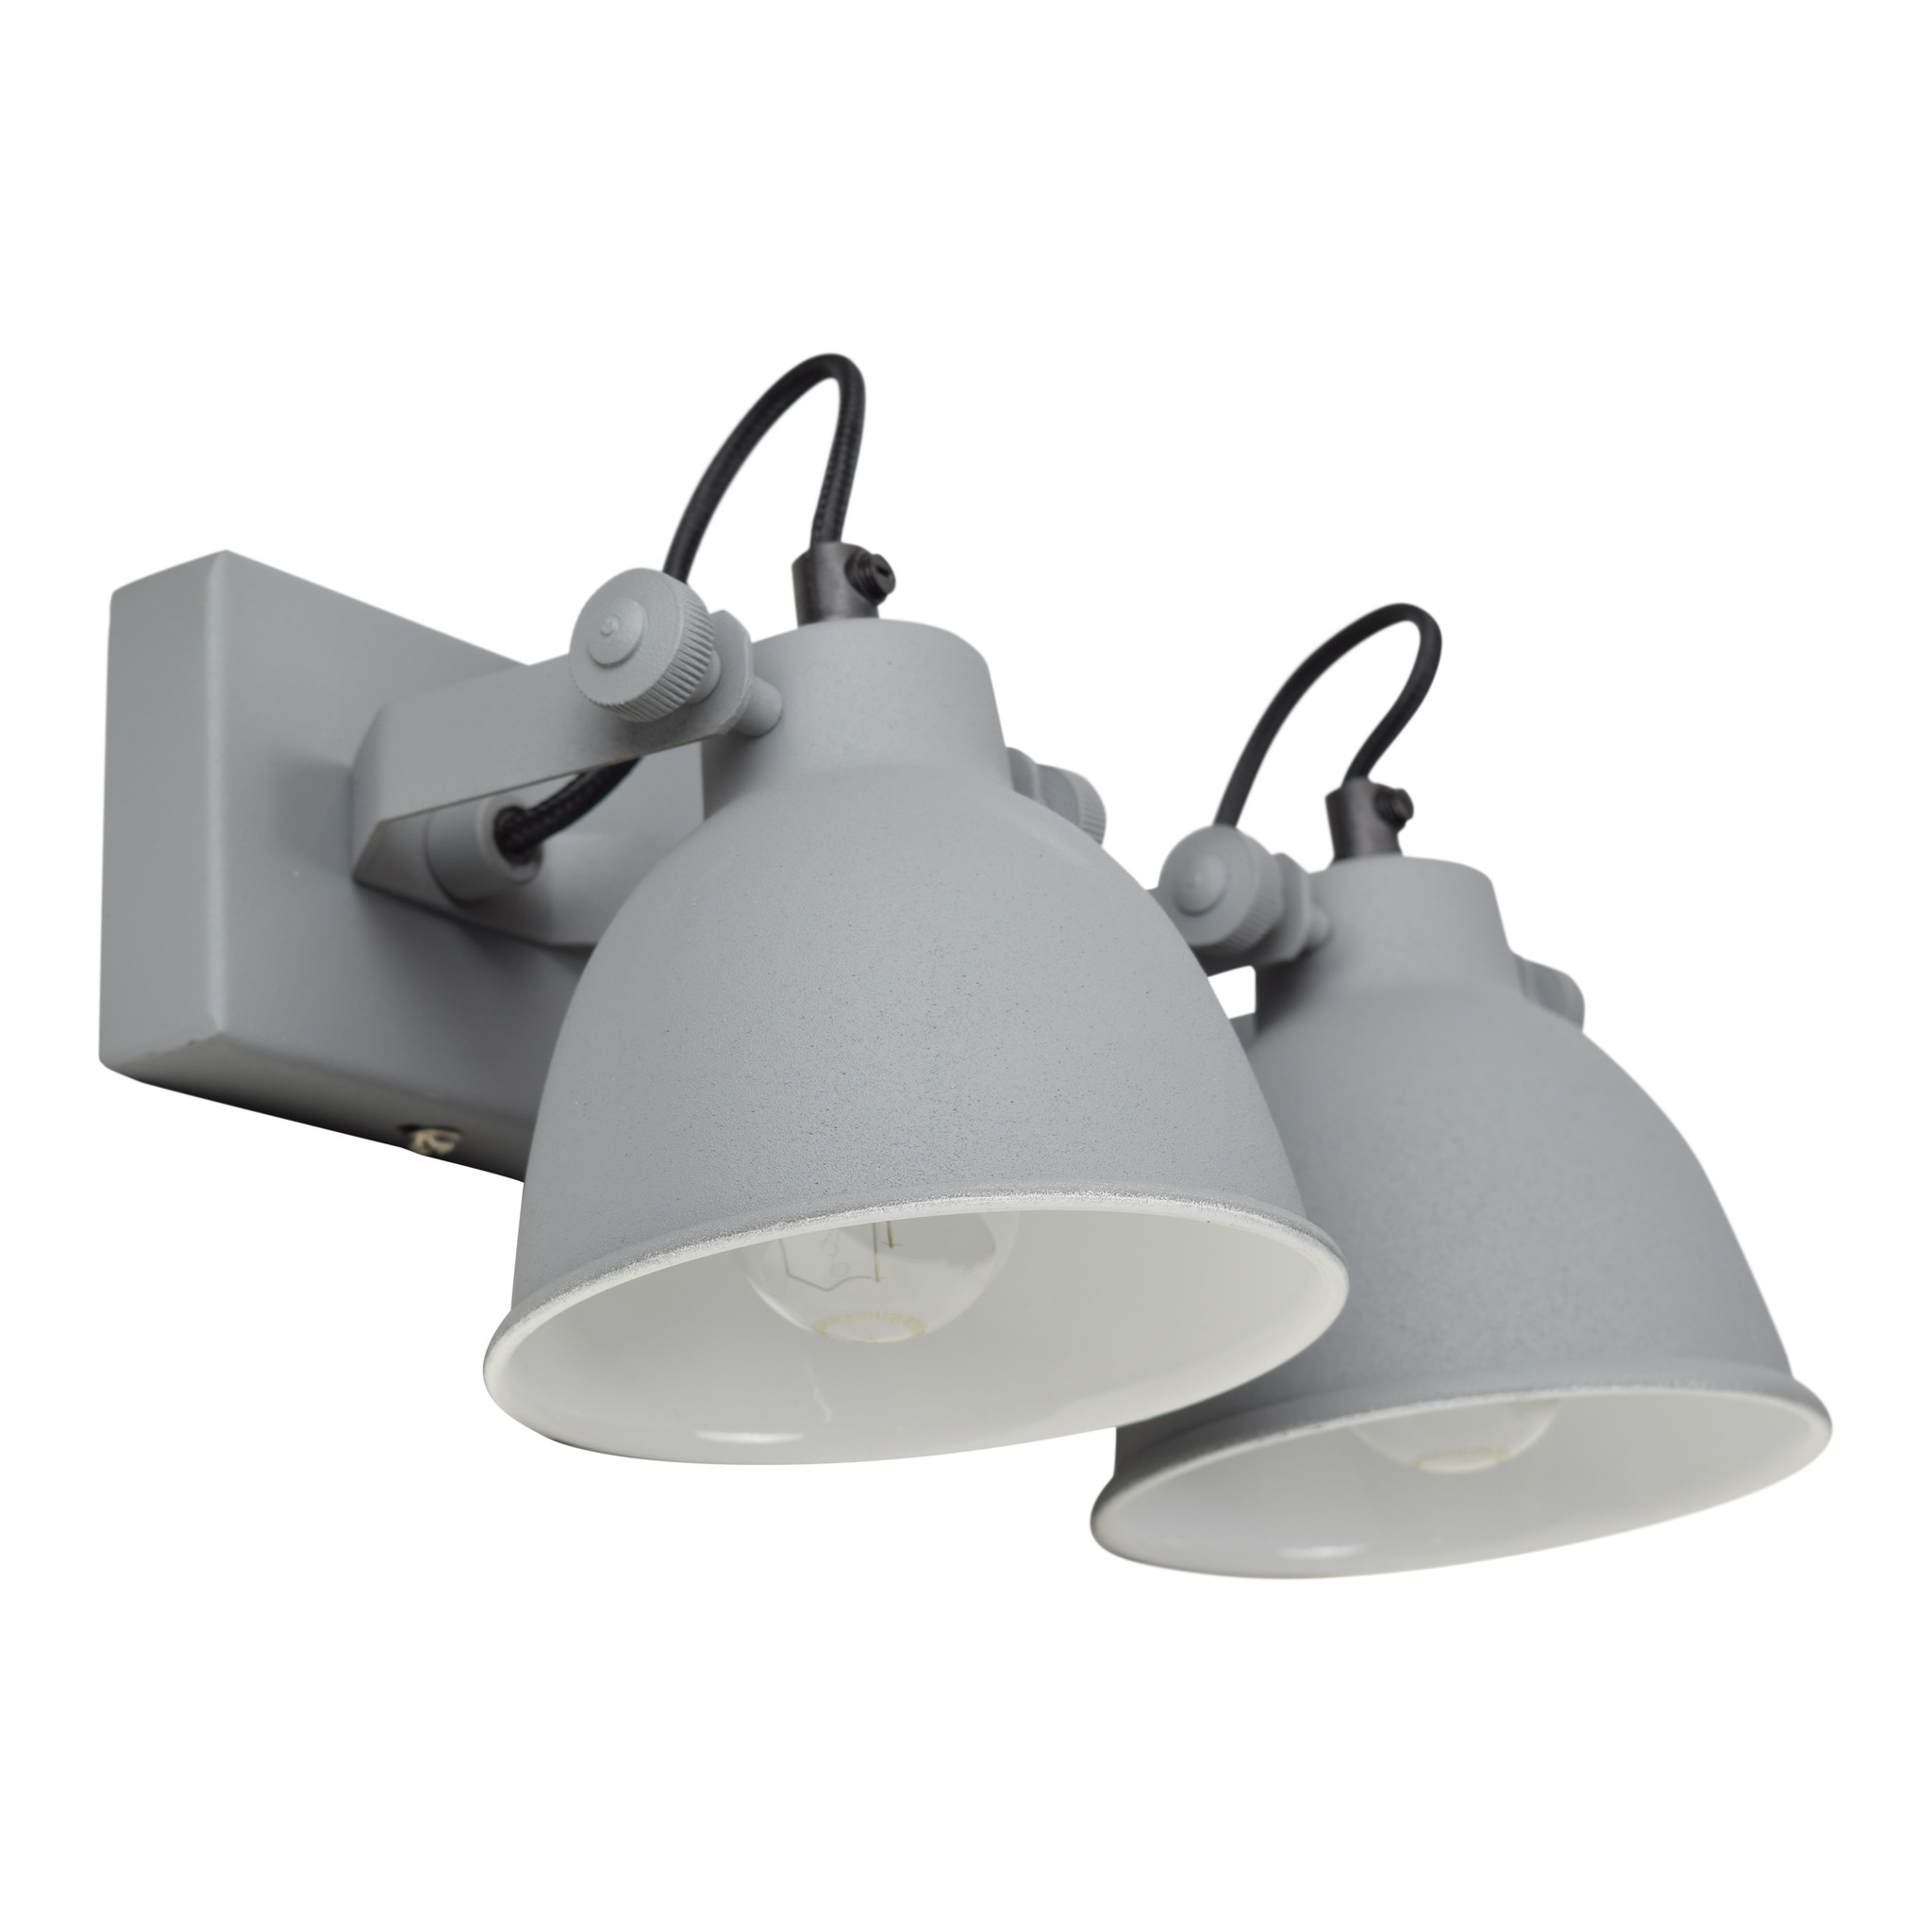 Urban Interiors Urban Interiors Wandlamp industrial double vintage grey-AI-WL-DBL-21-VG-8719325005509